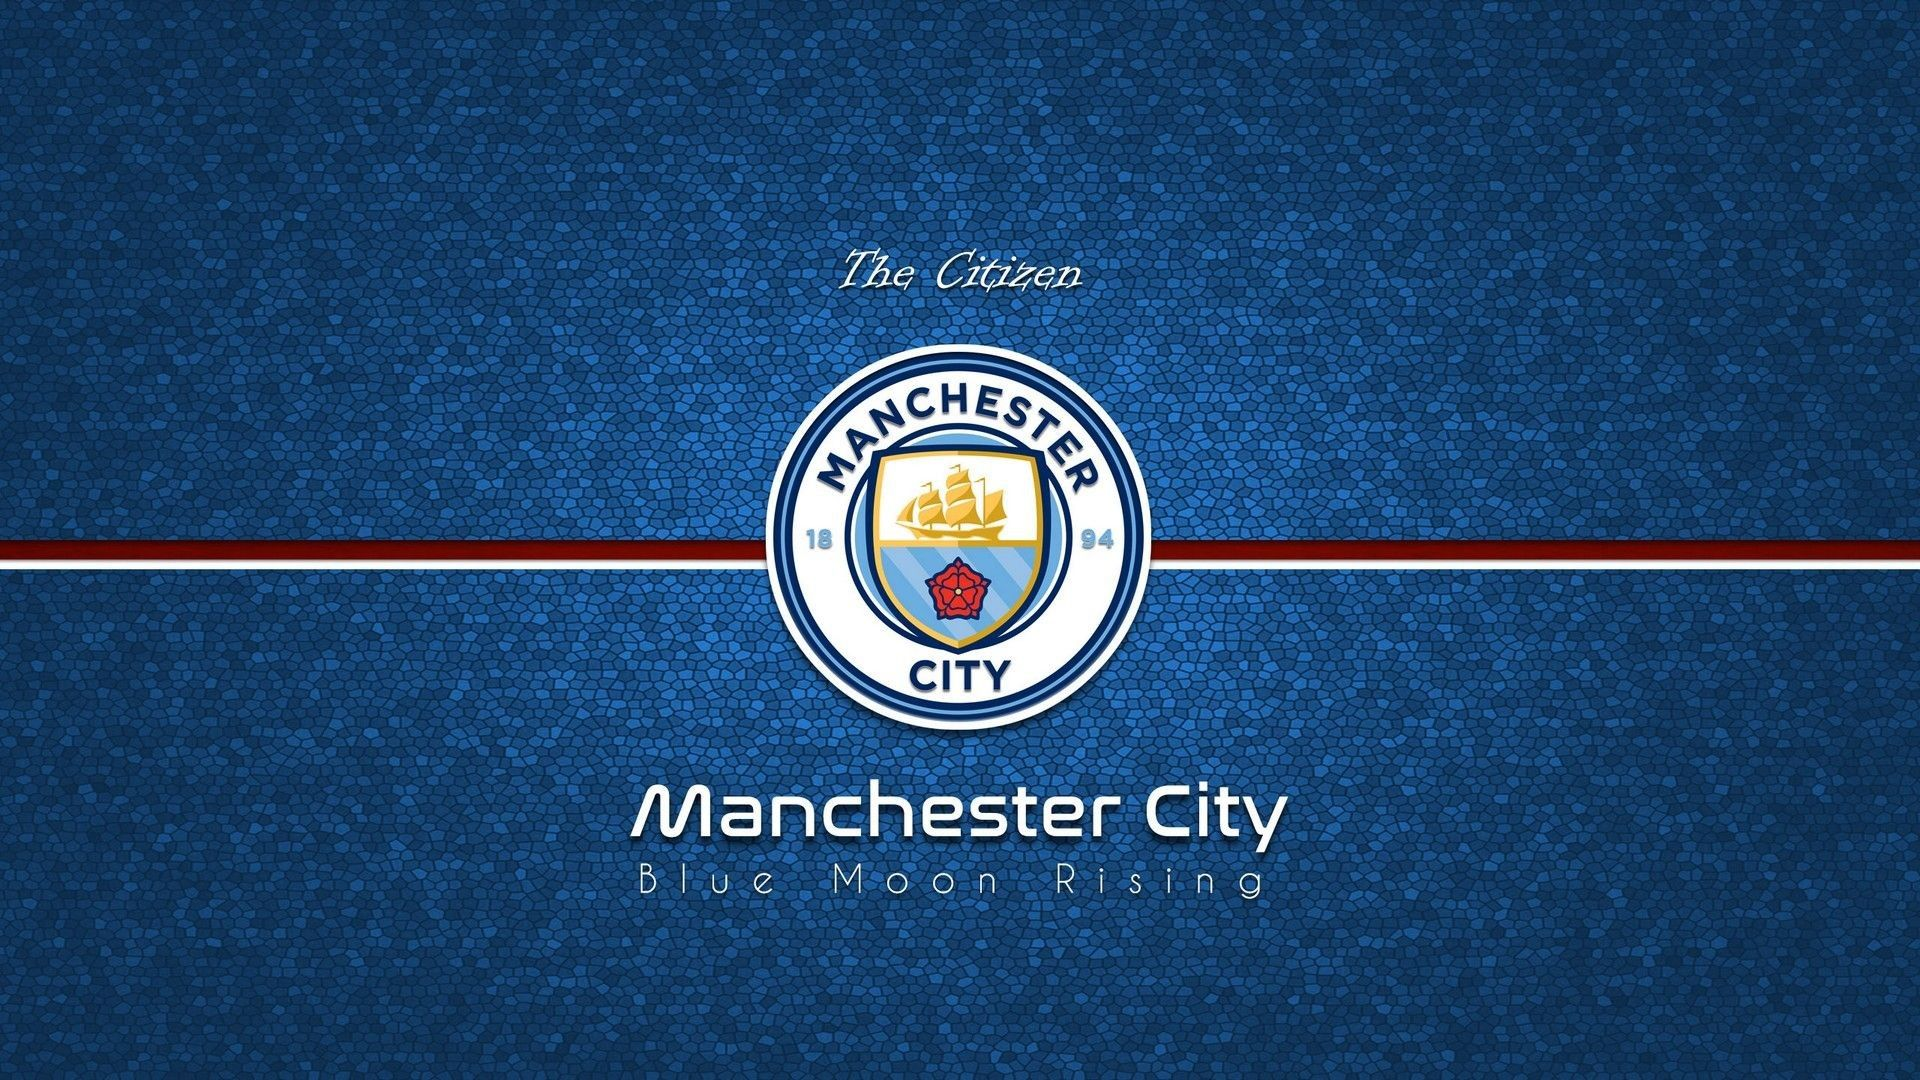 Beautiful Manchester City Wallpaper